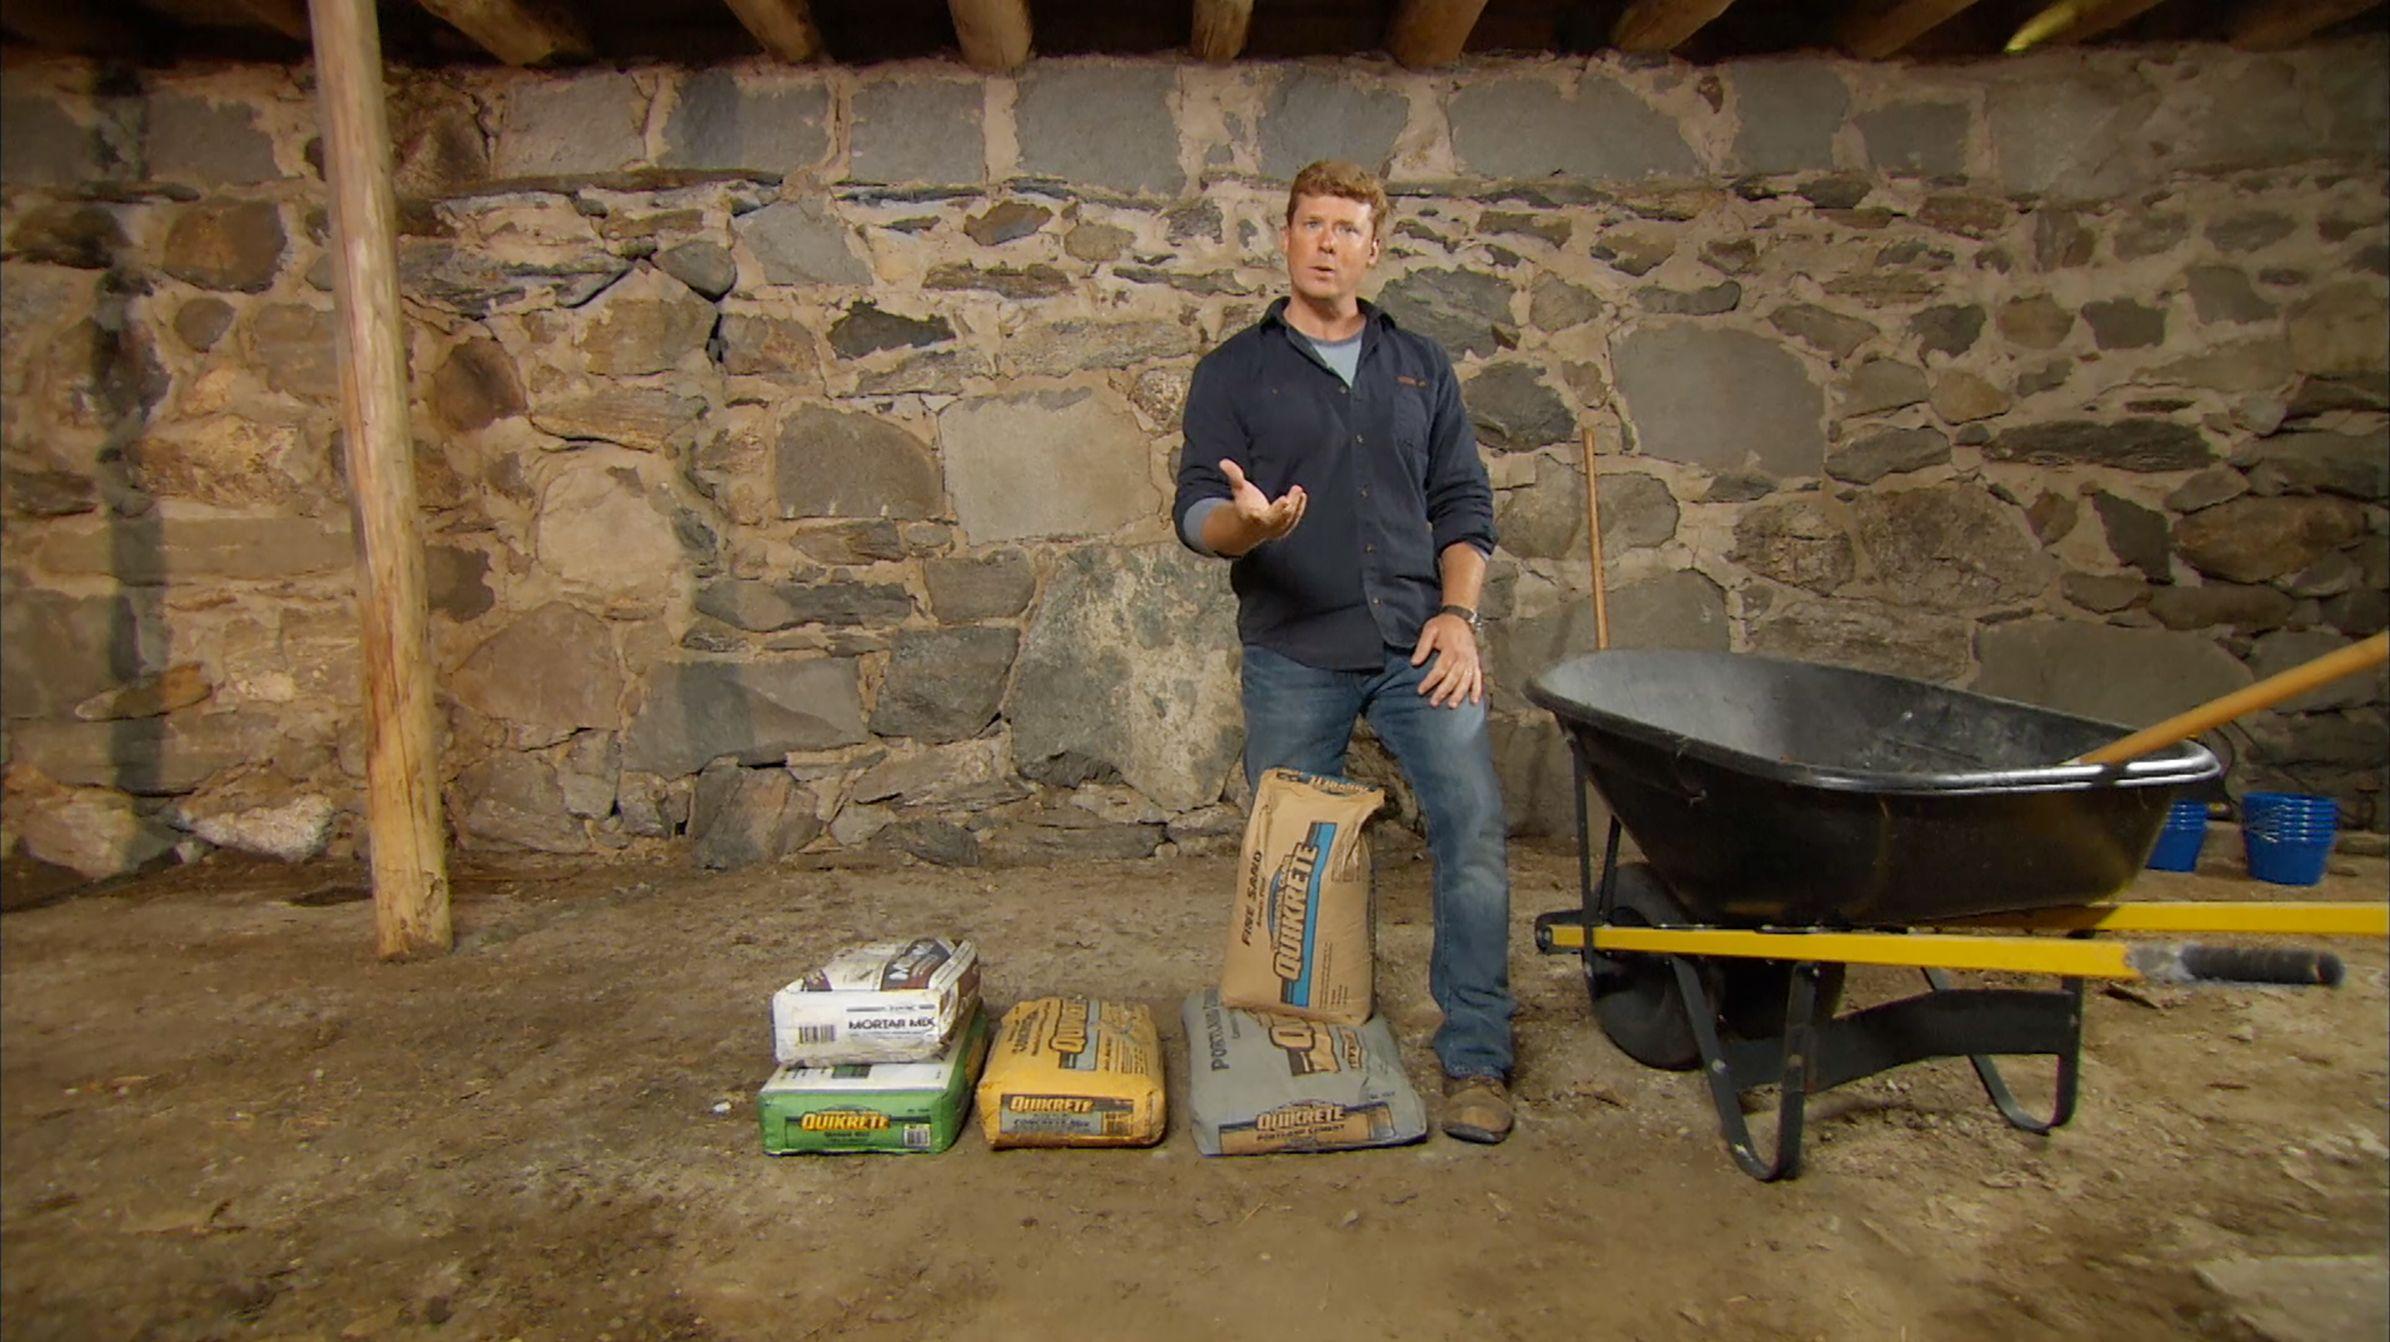 Understanding Concrete, Cement, and Mortar | Concrete cement ...